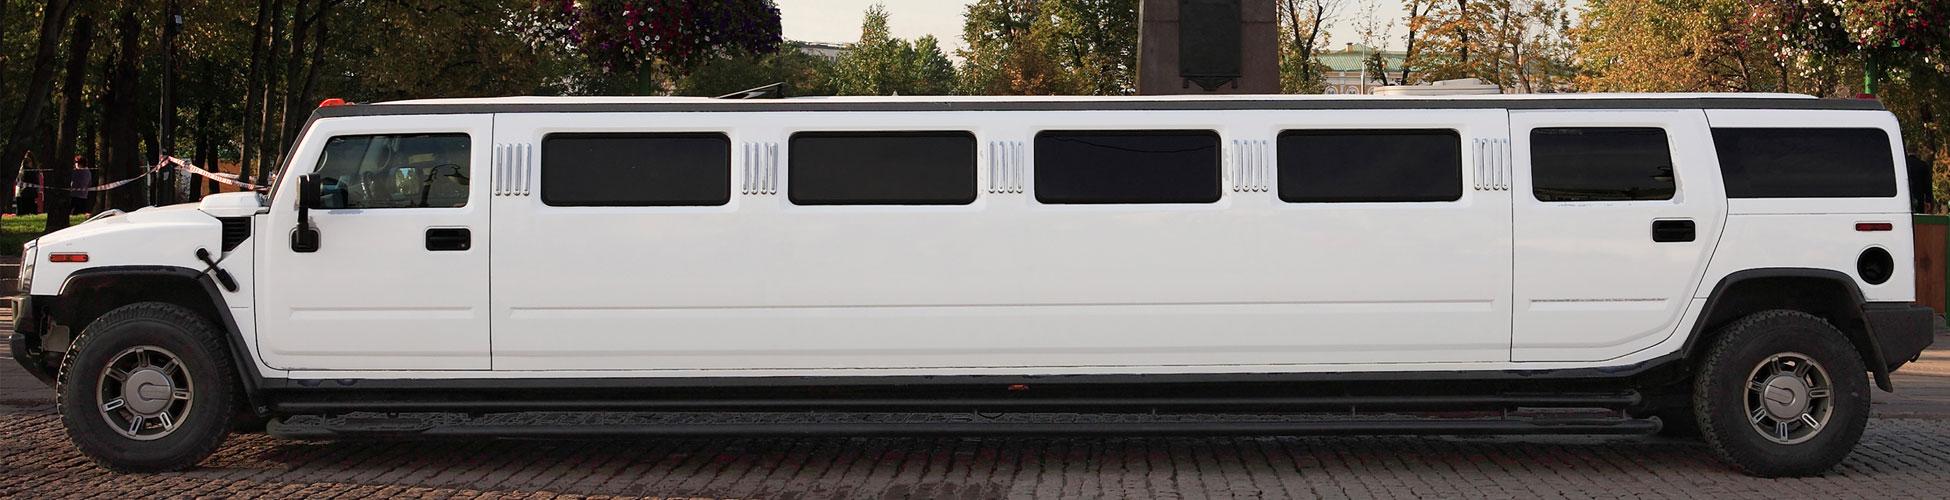 Suv Limo Service Suv Limousine Rental Baltimore Dc